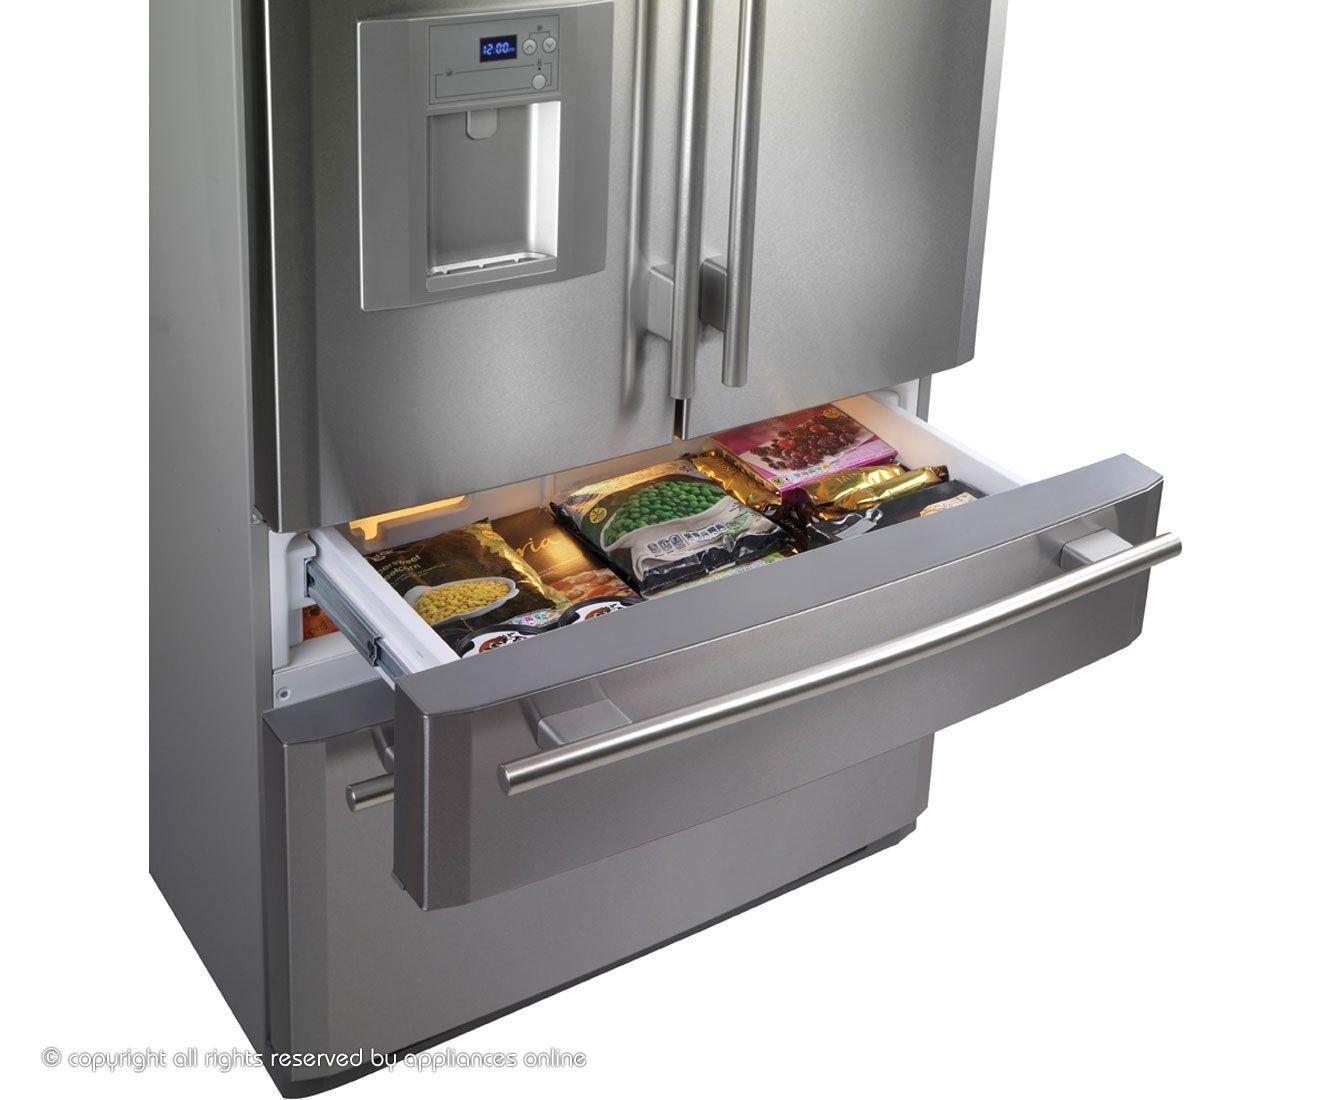 Big Freezers Rangemaster Dxd Rdxd910ss C American Fridge Freezer Stainless Steel Fridge Freezers American